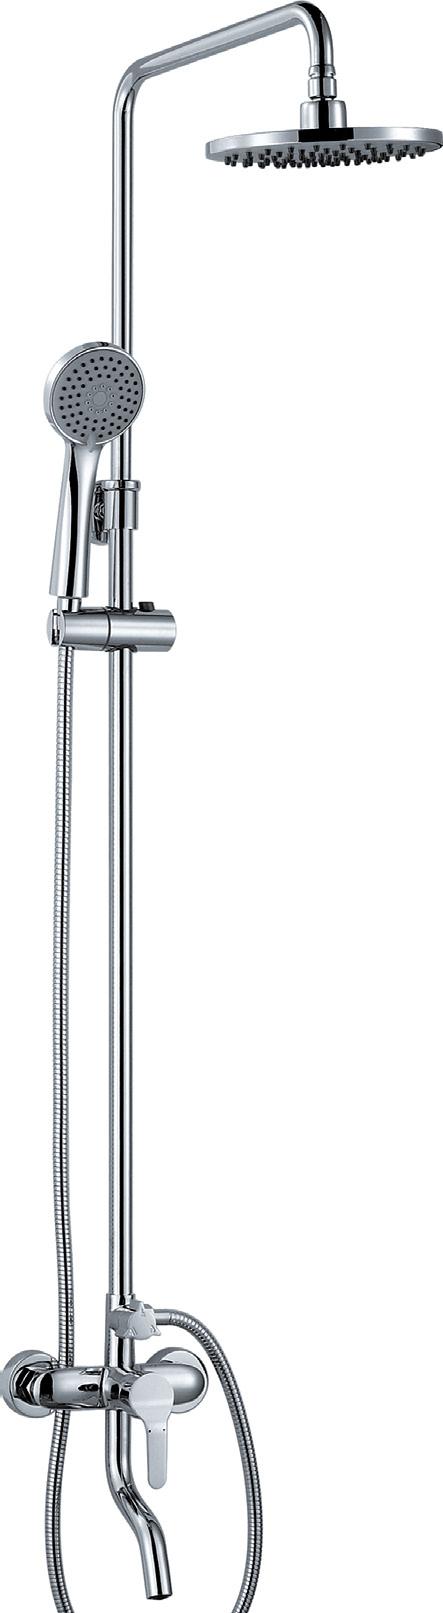 Shower Faucet Shower Manufacturers, Shower Faucet Shower Factory, Supply Shower Faucet Shower